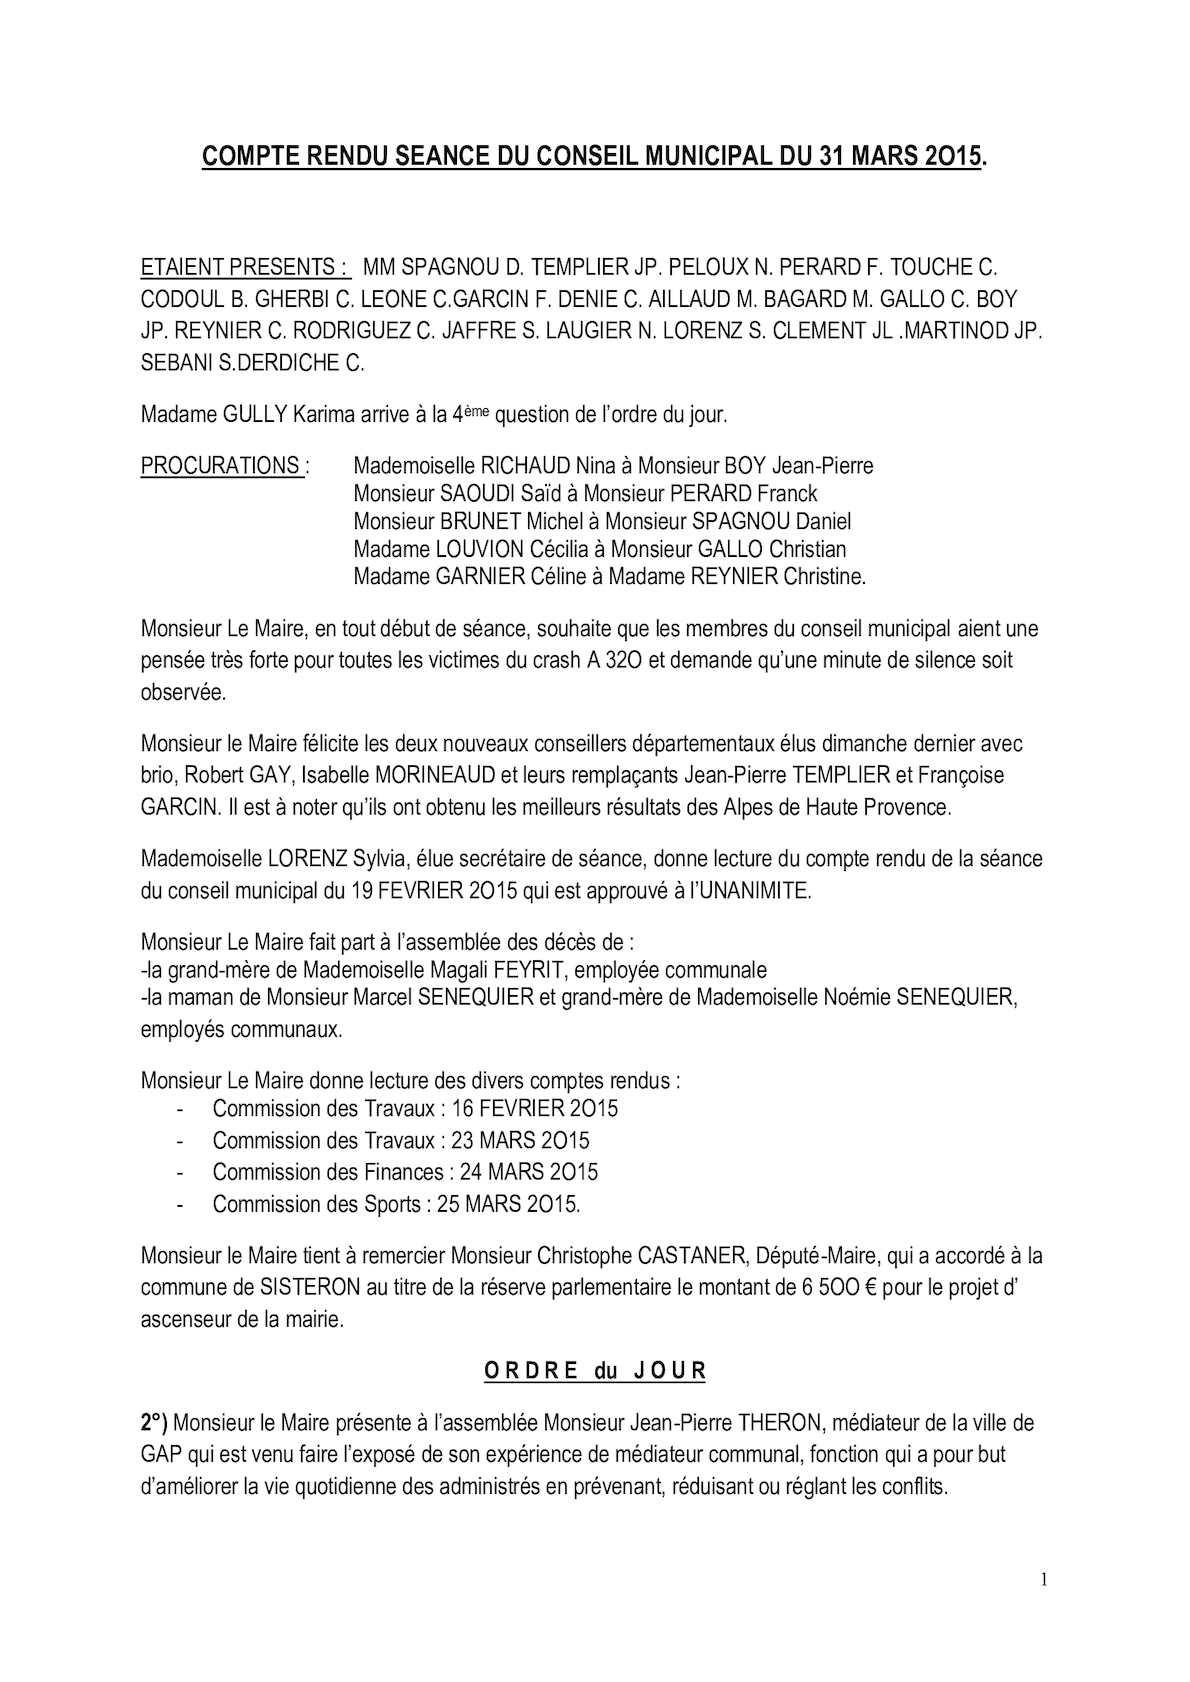 Calaméo - Compte rendu du conseil municipal du 31 Mars 2015 0b42945c9db0